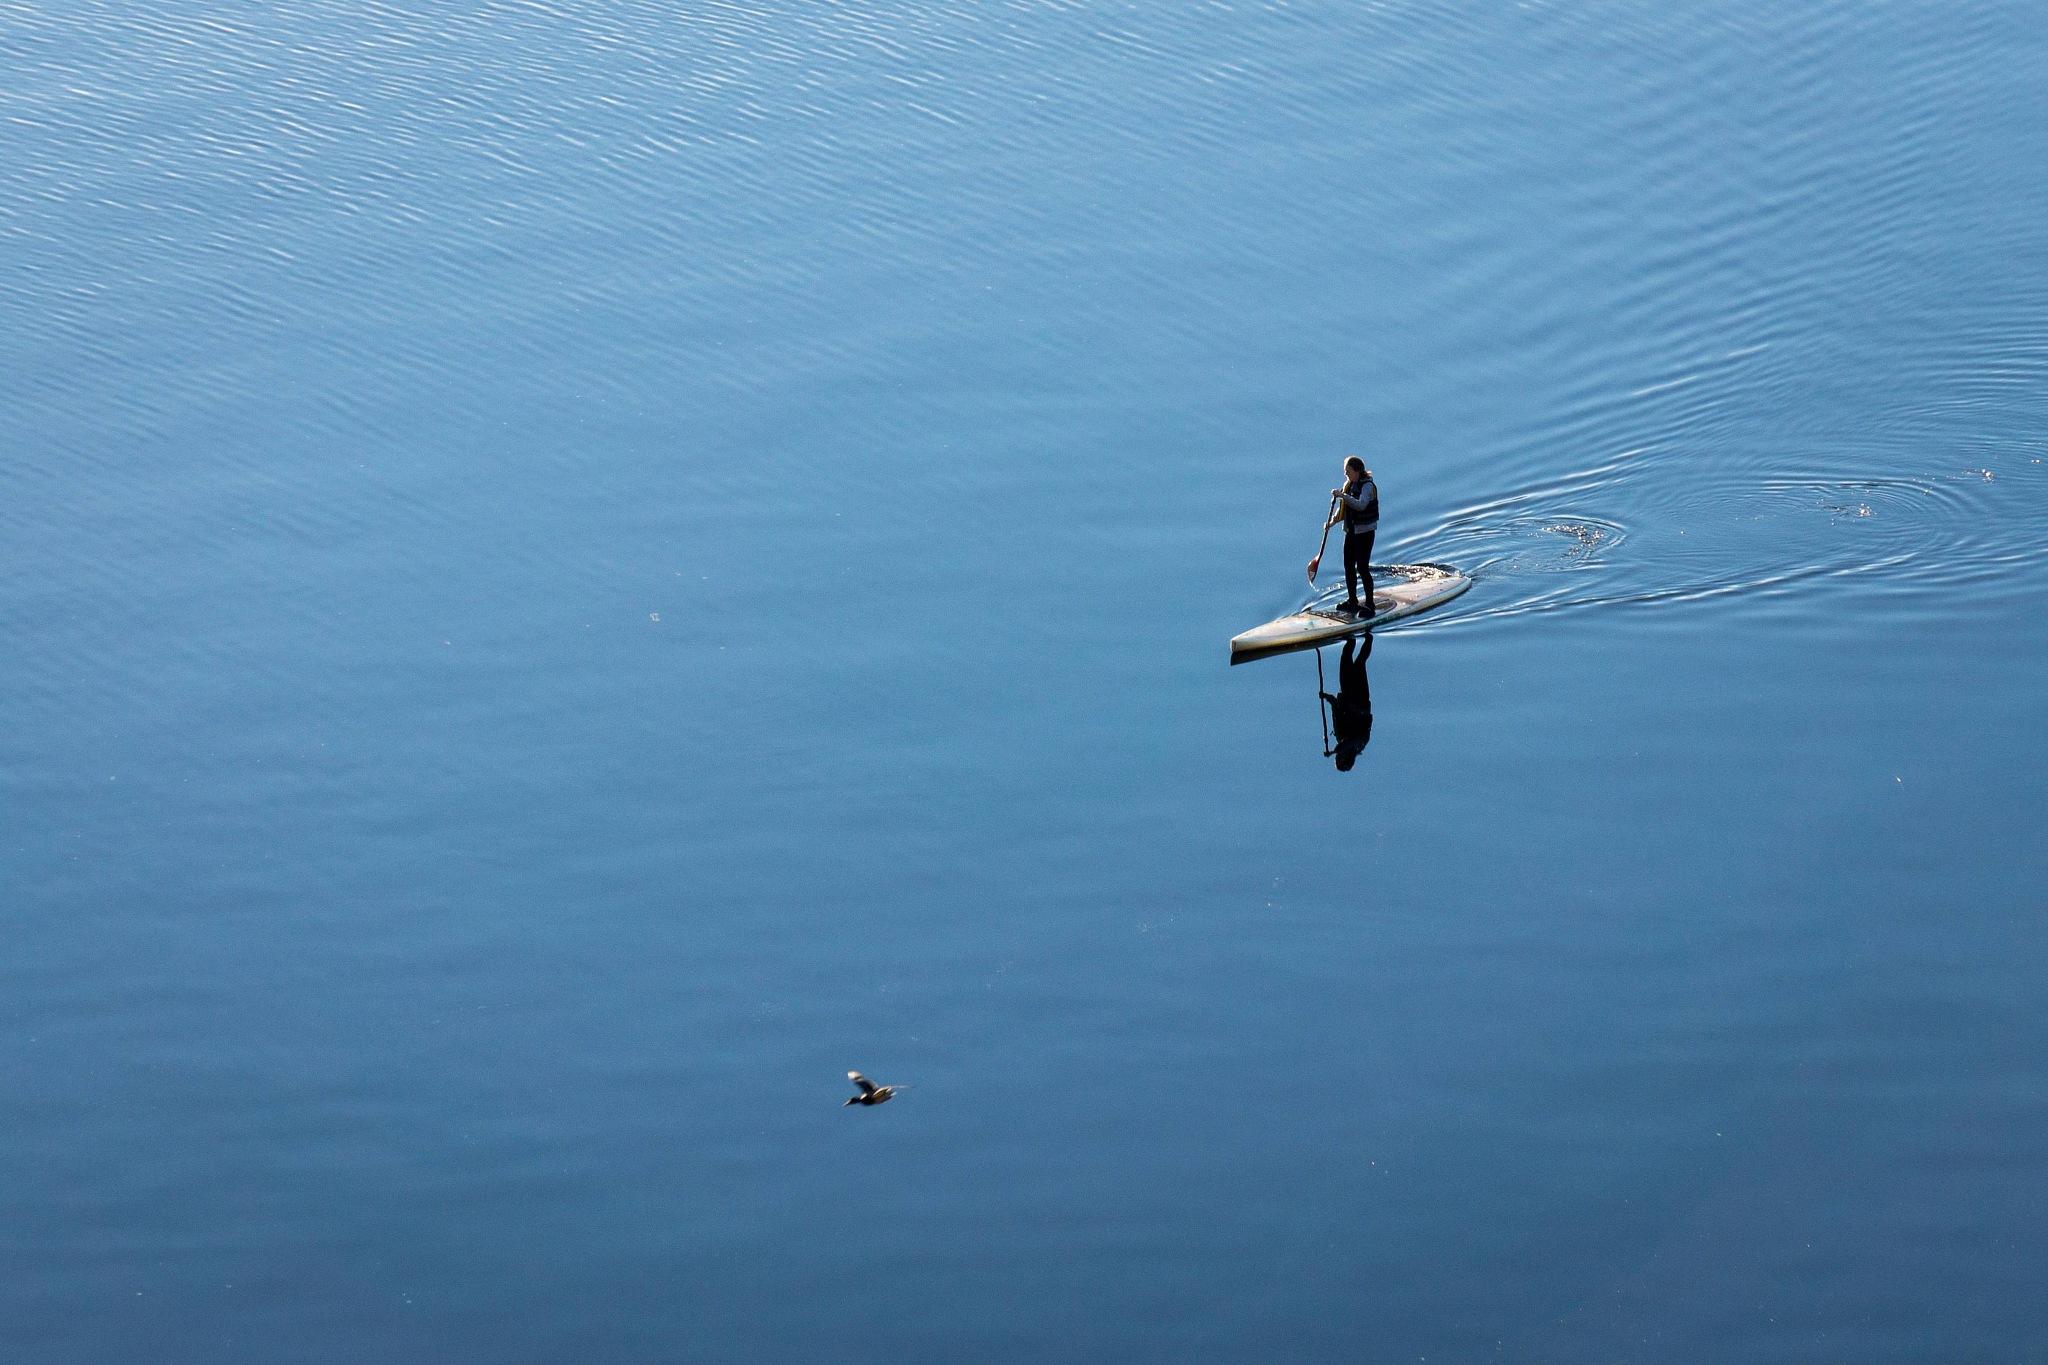 Following the bird by Mauro Valli